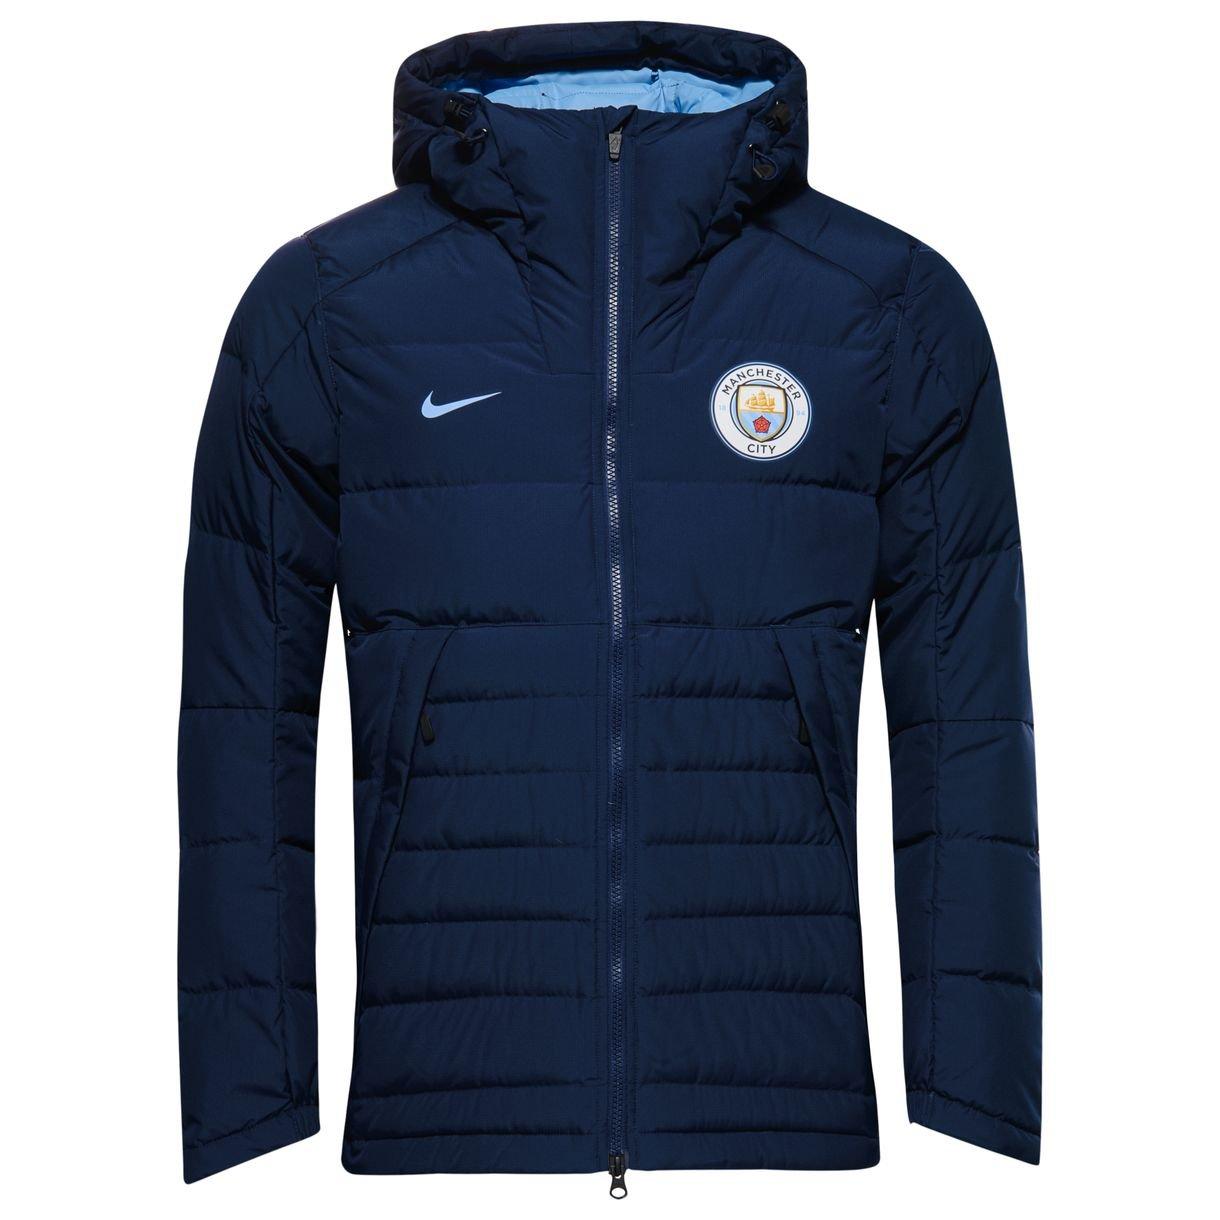 a9fbd2238d049 2016-2017 Man City Nike Core Down Jacket (Navy), Jackets - Amazon Canada